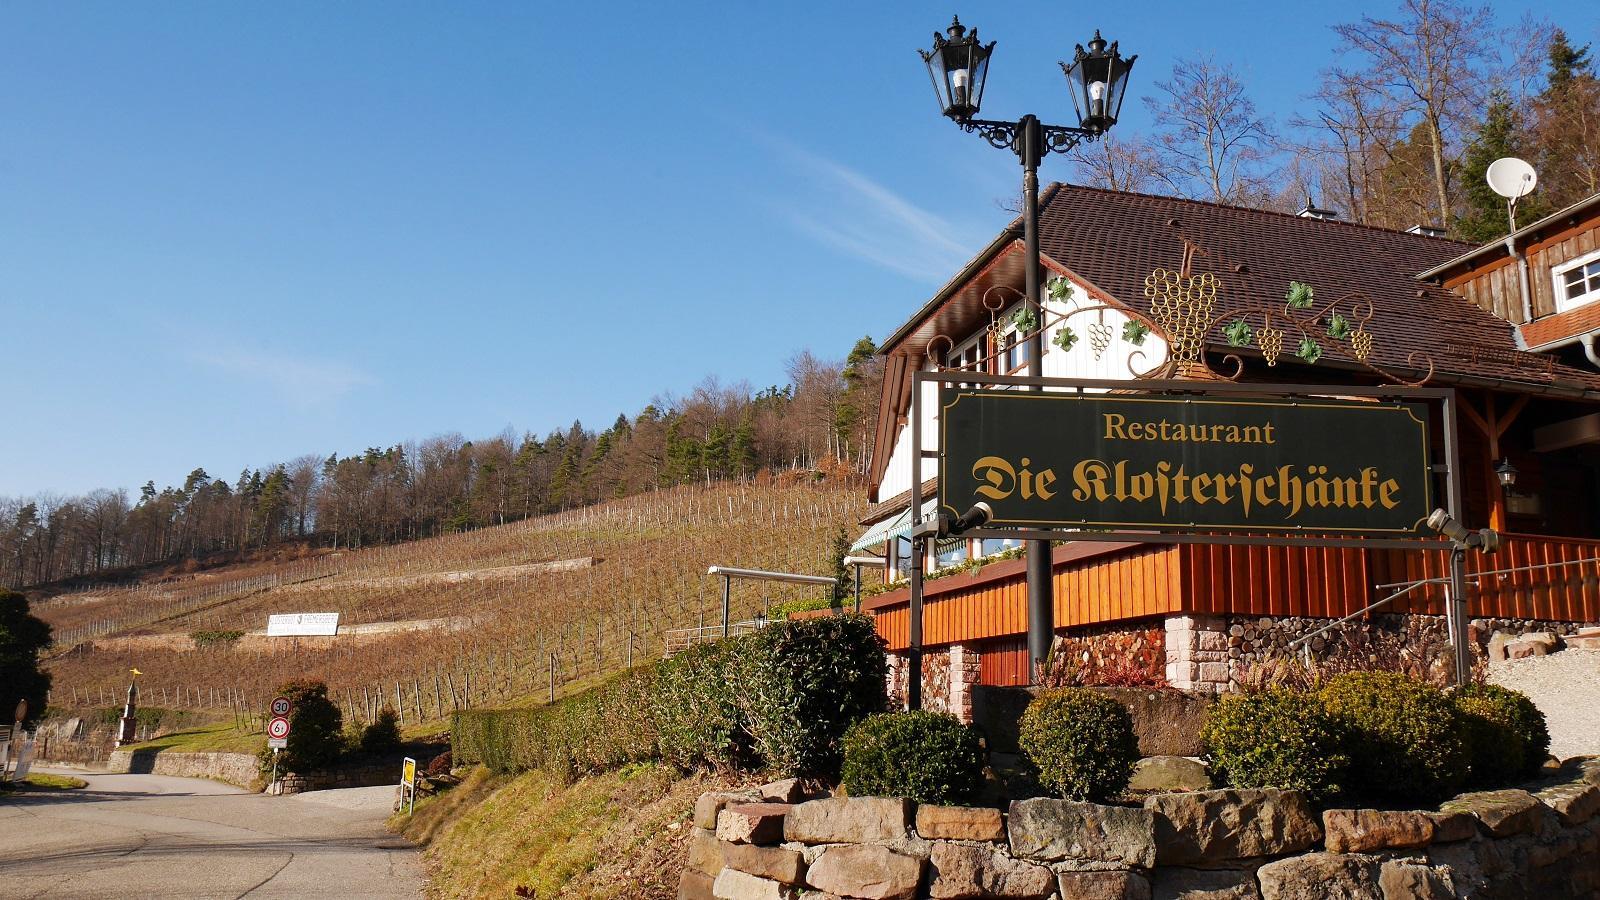 Fremersberg (525m) par Waldparkplatz Droschkenweg ‒ Nordschwarzwald ...